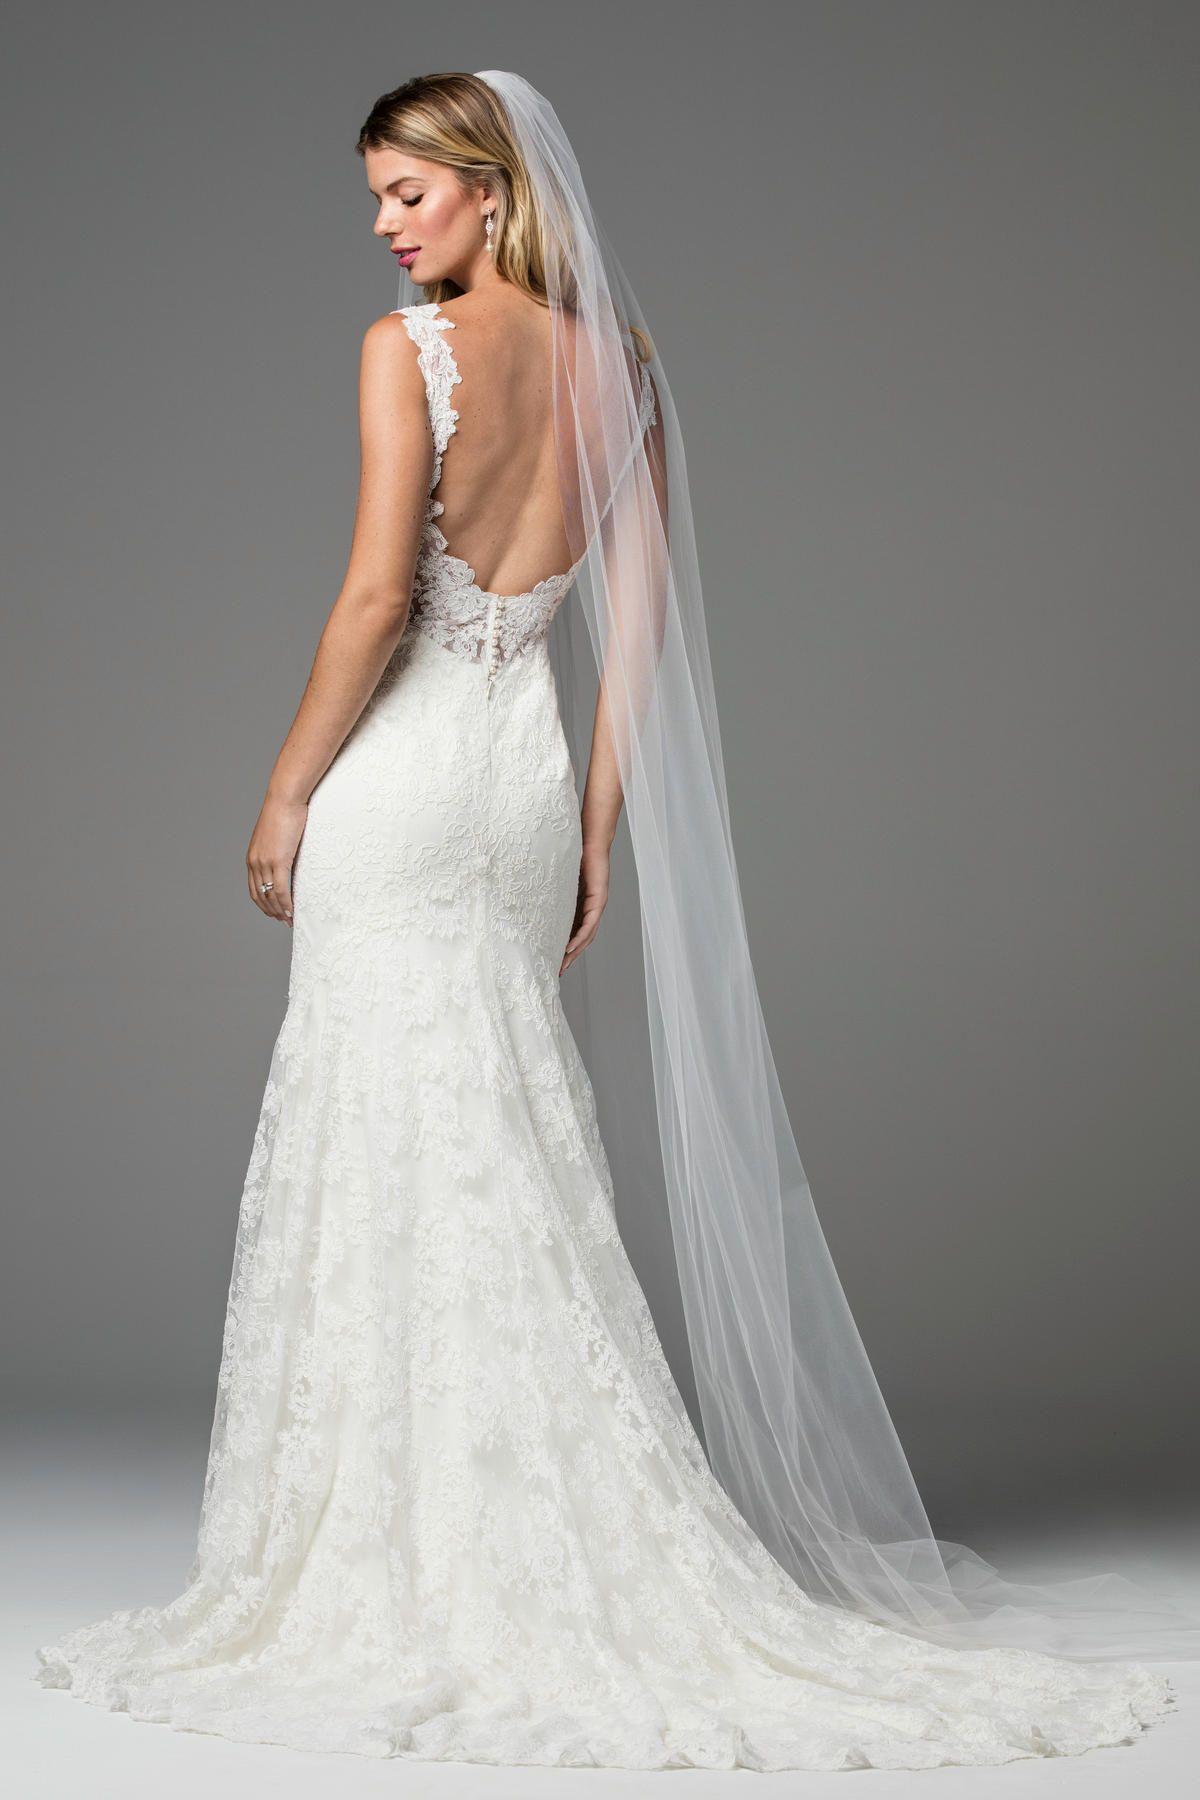 18116 Watters WTOO // The Bridal Room VA   WTOO   Pinterest   Bridal ...